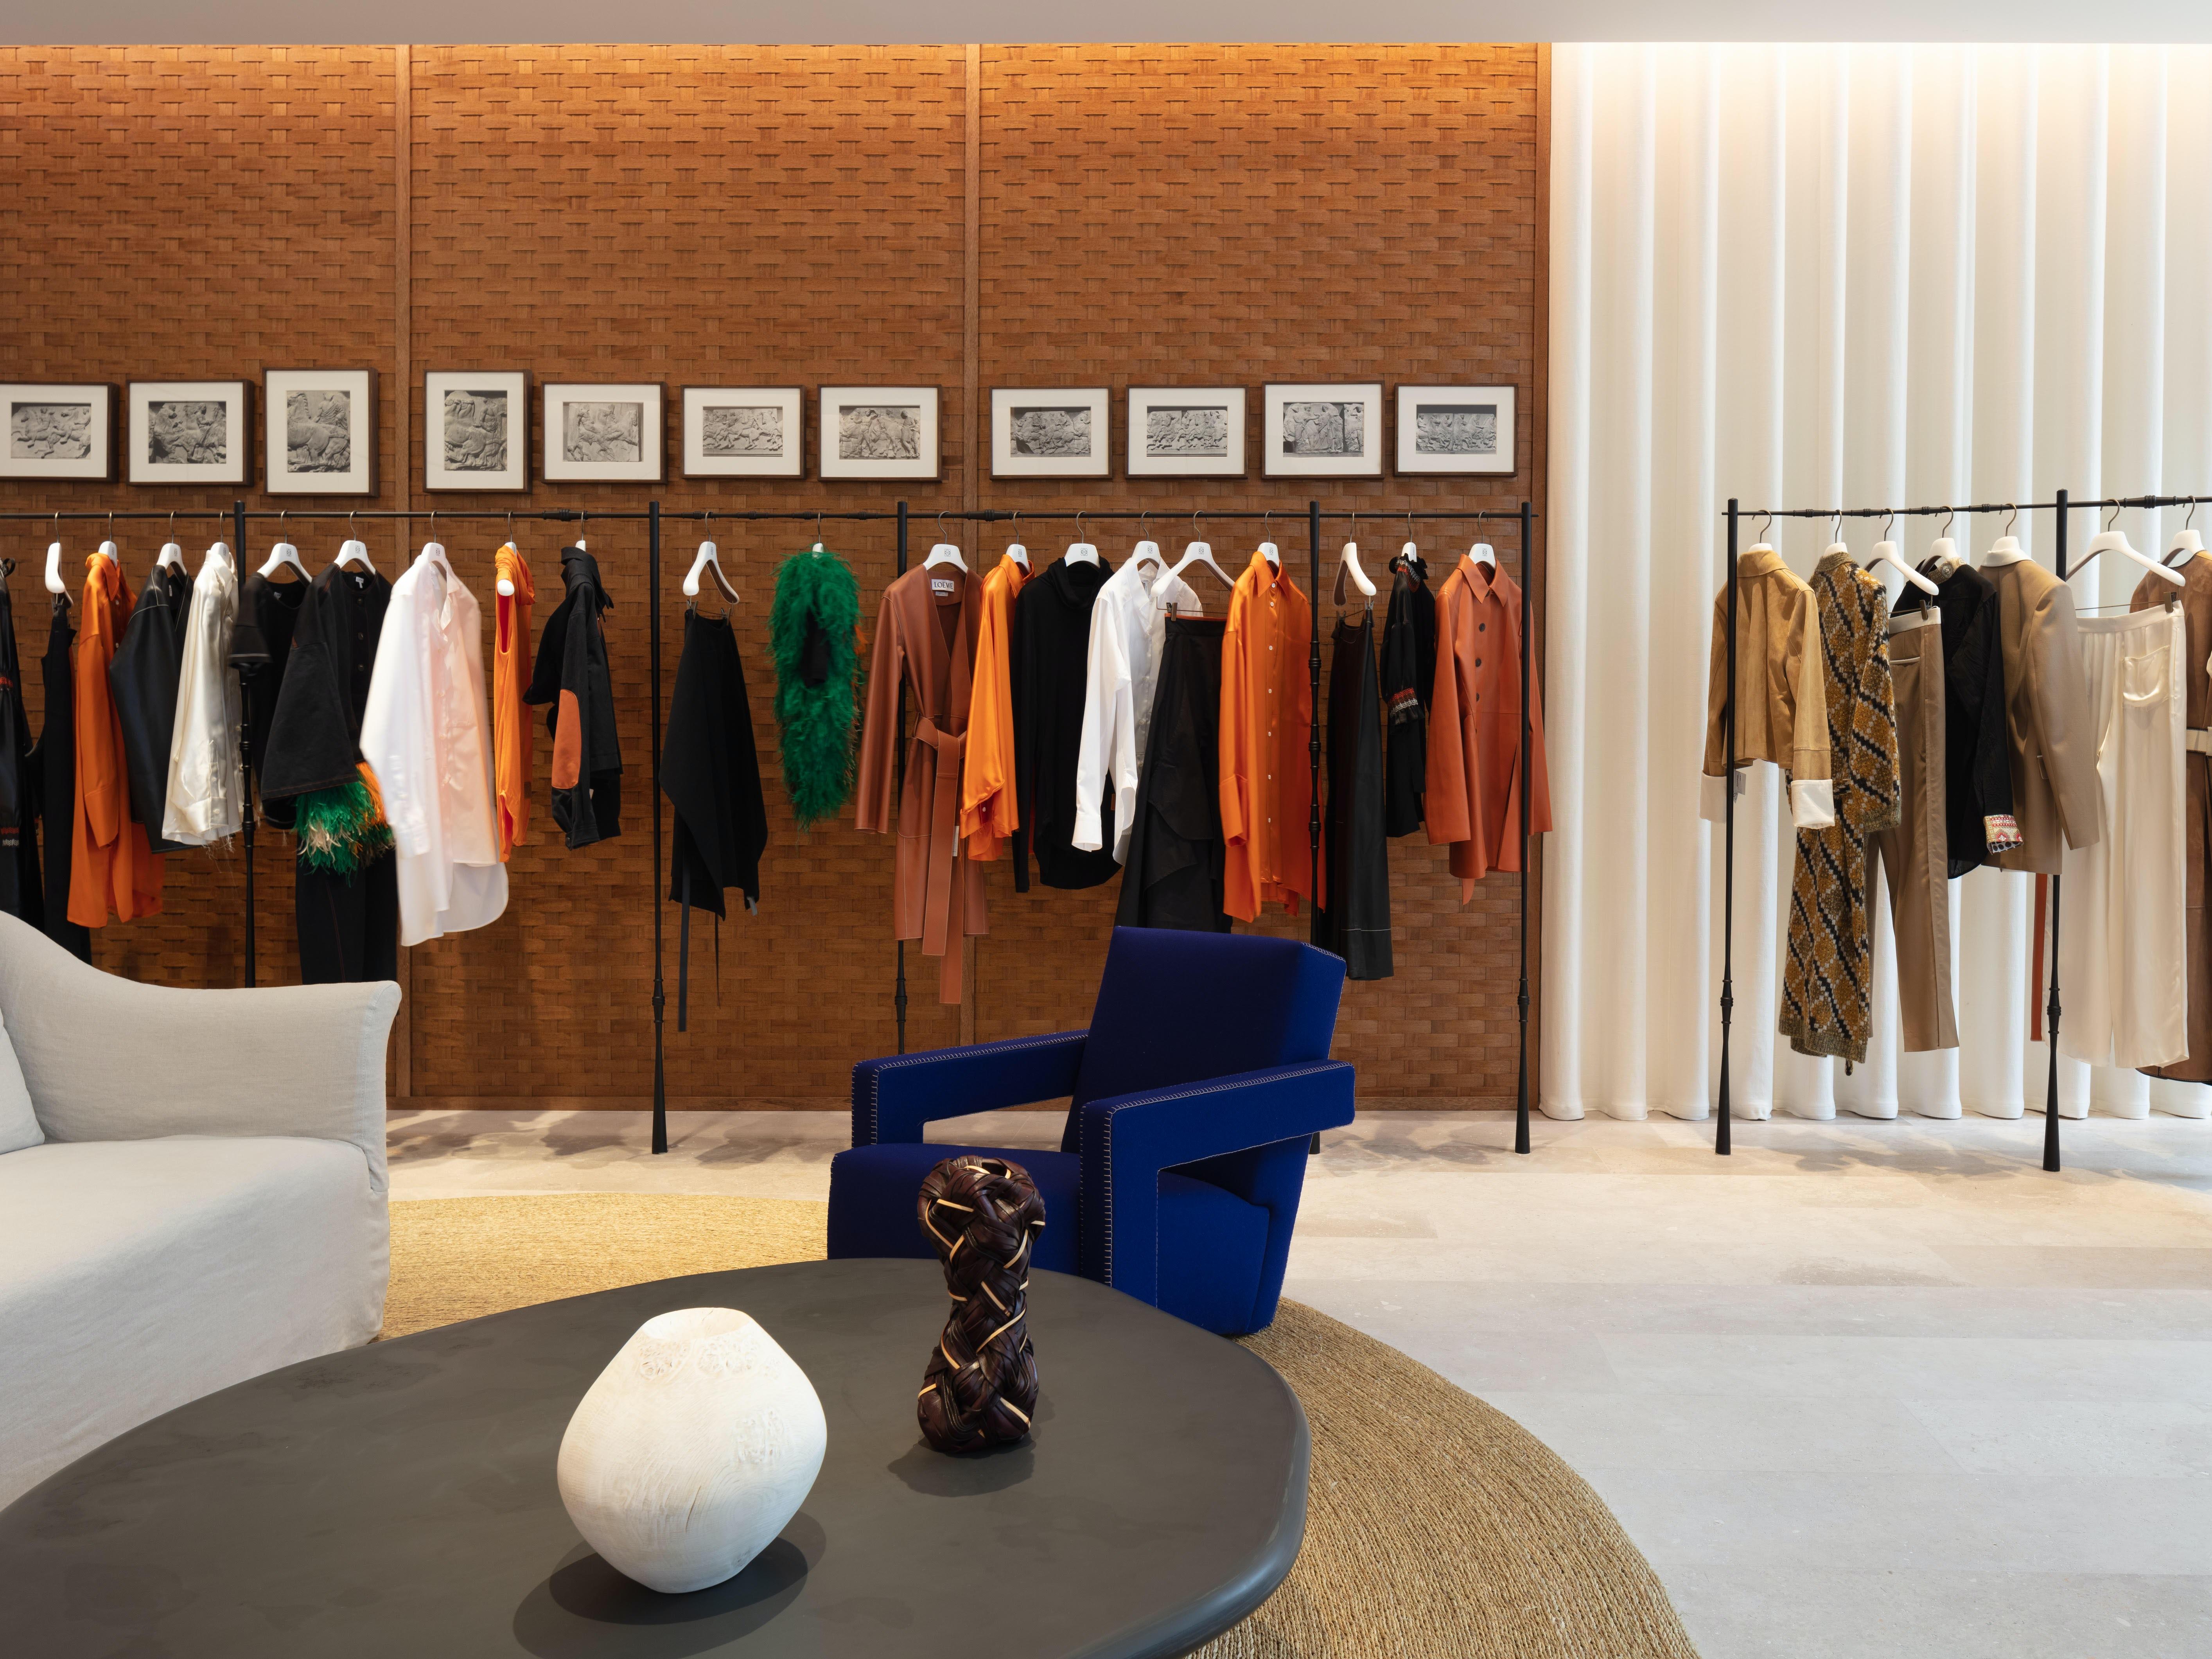 Inside the new Loewe store on Bond Street | Source: Courtesy